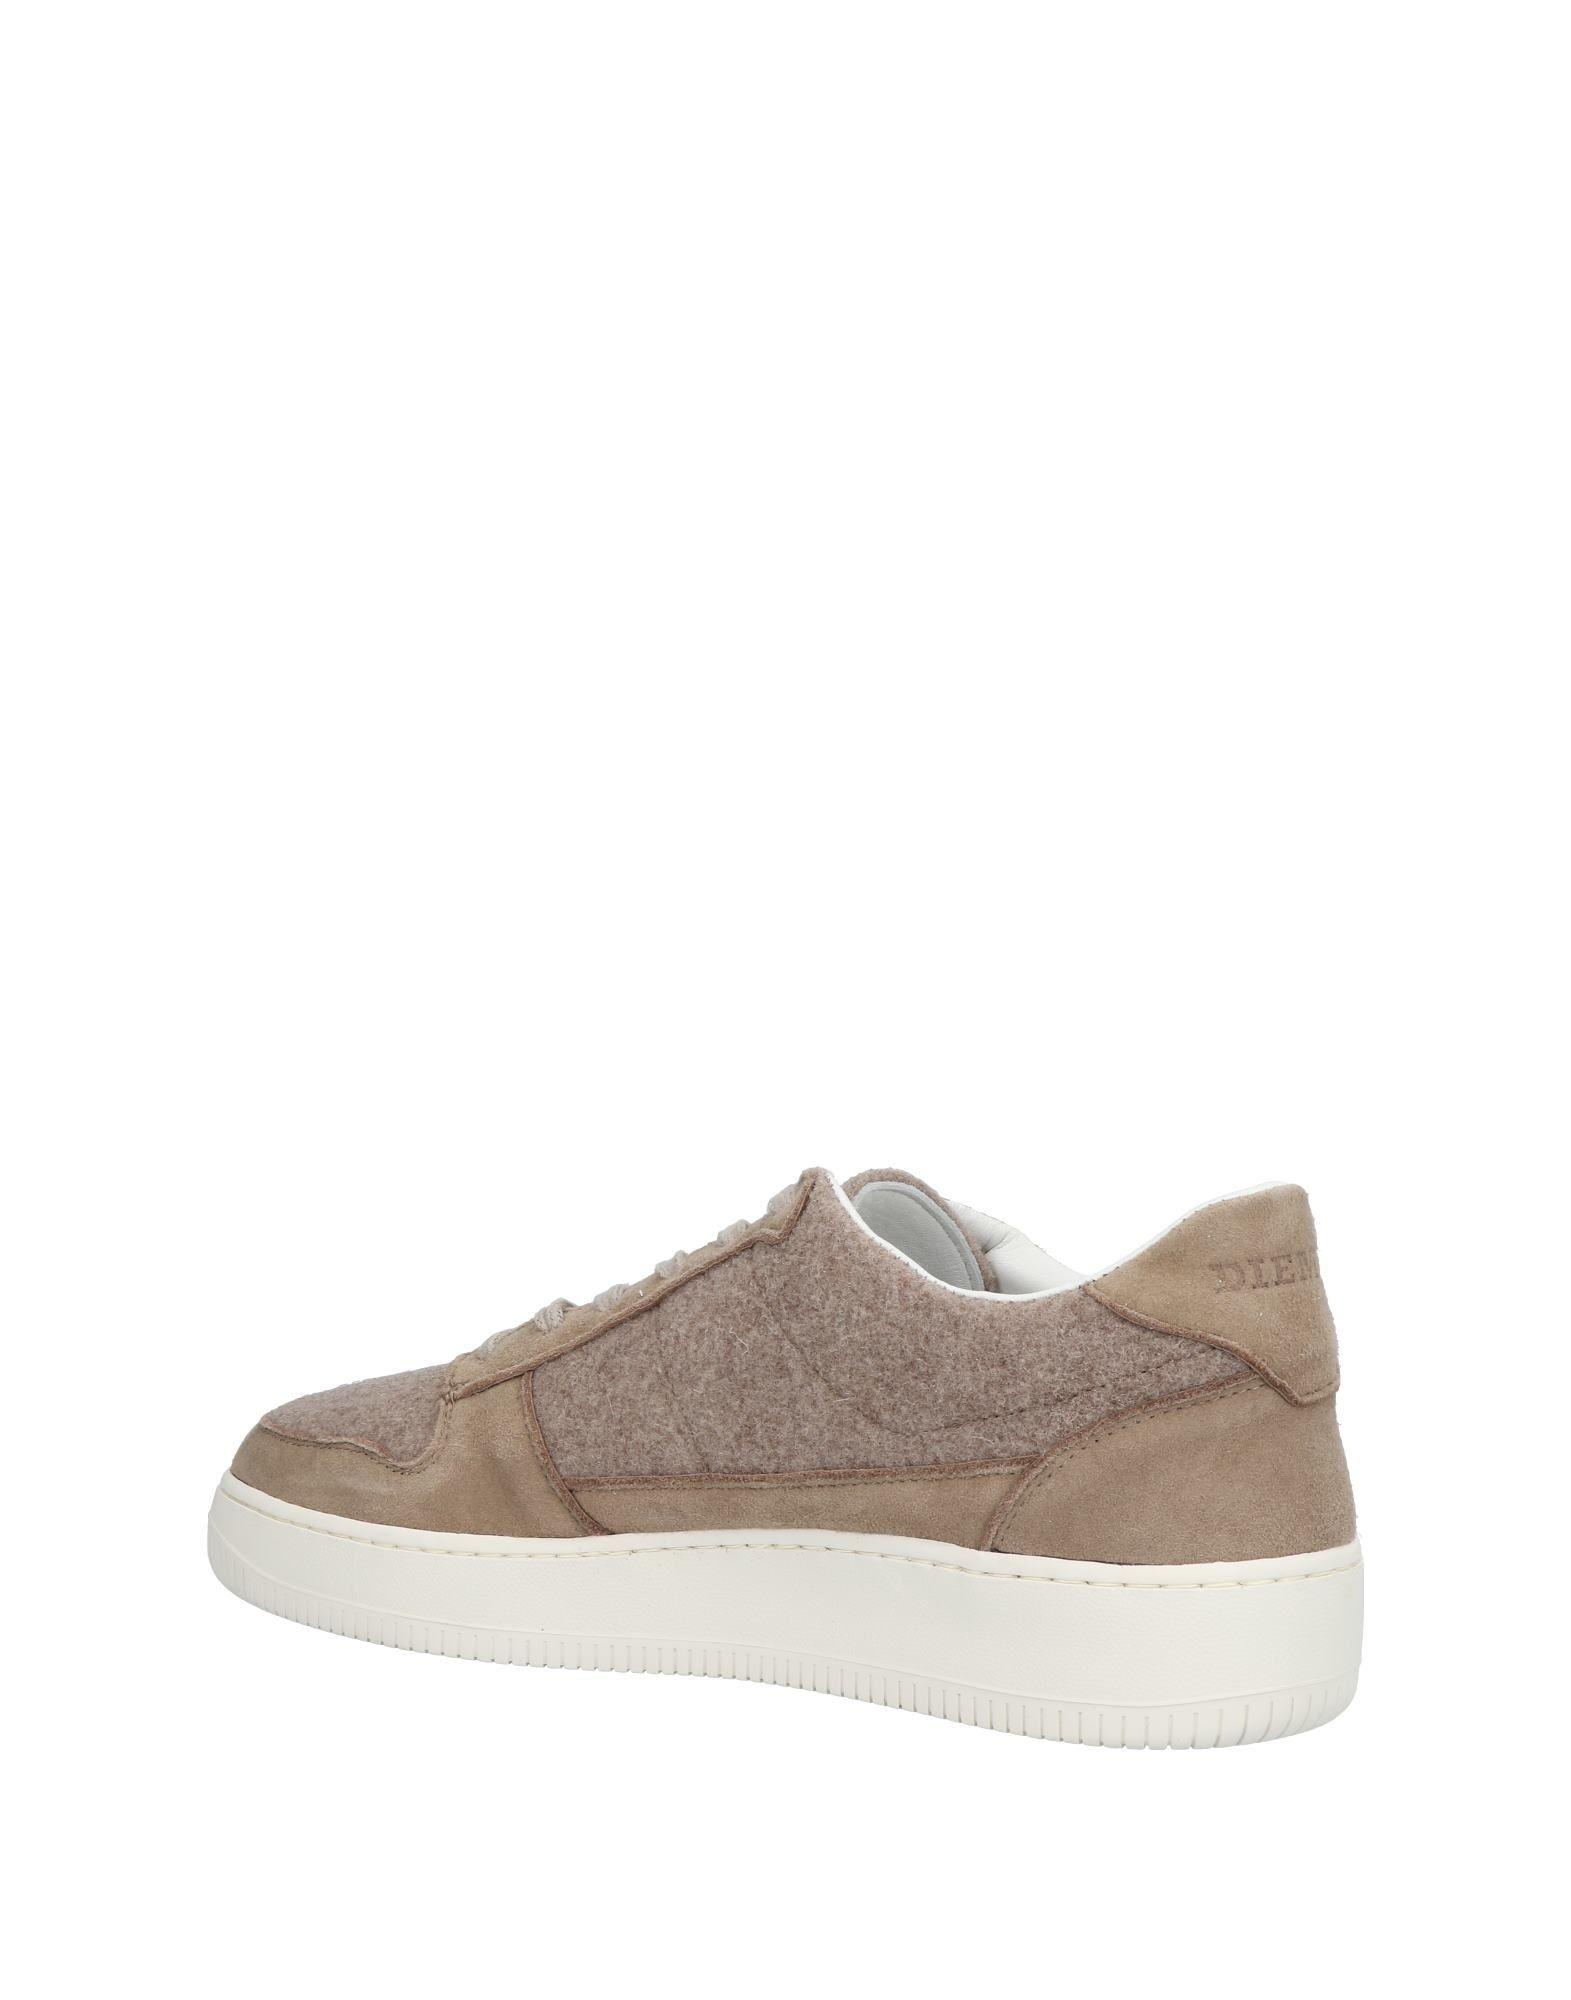 Diemme Sneakers Herren  11418879FX Schuhe Gute Qualität beliebte Schuhe 11418879FX 70c233